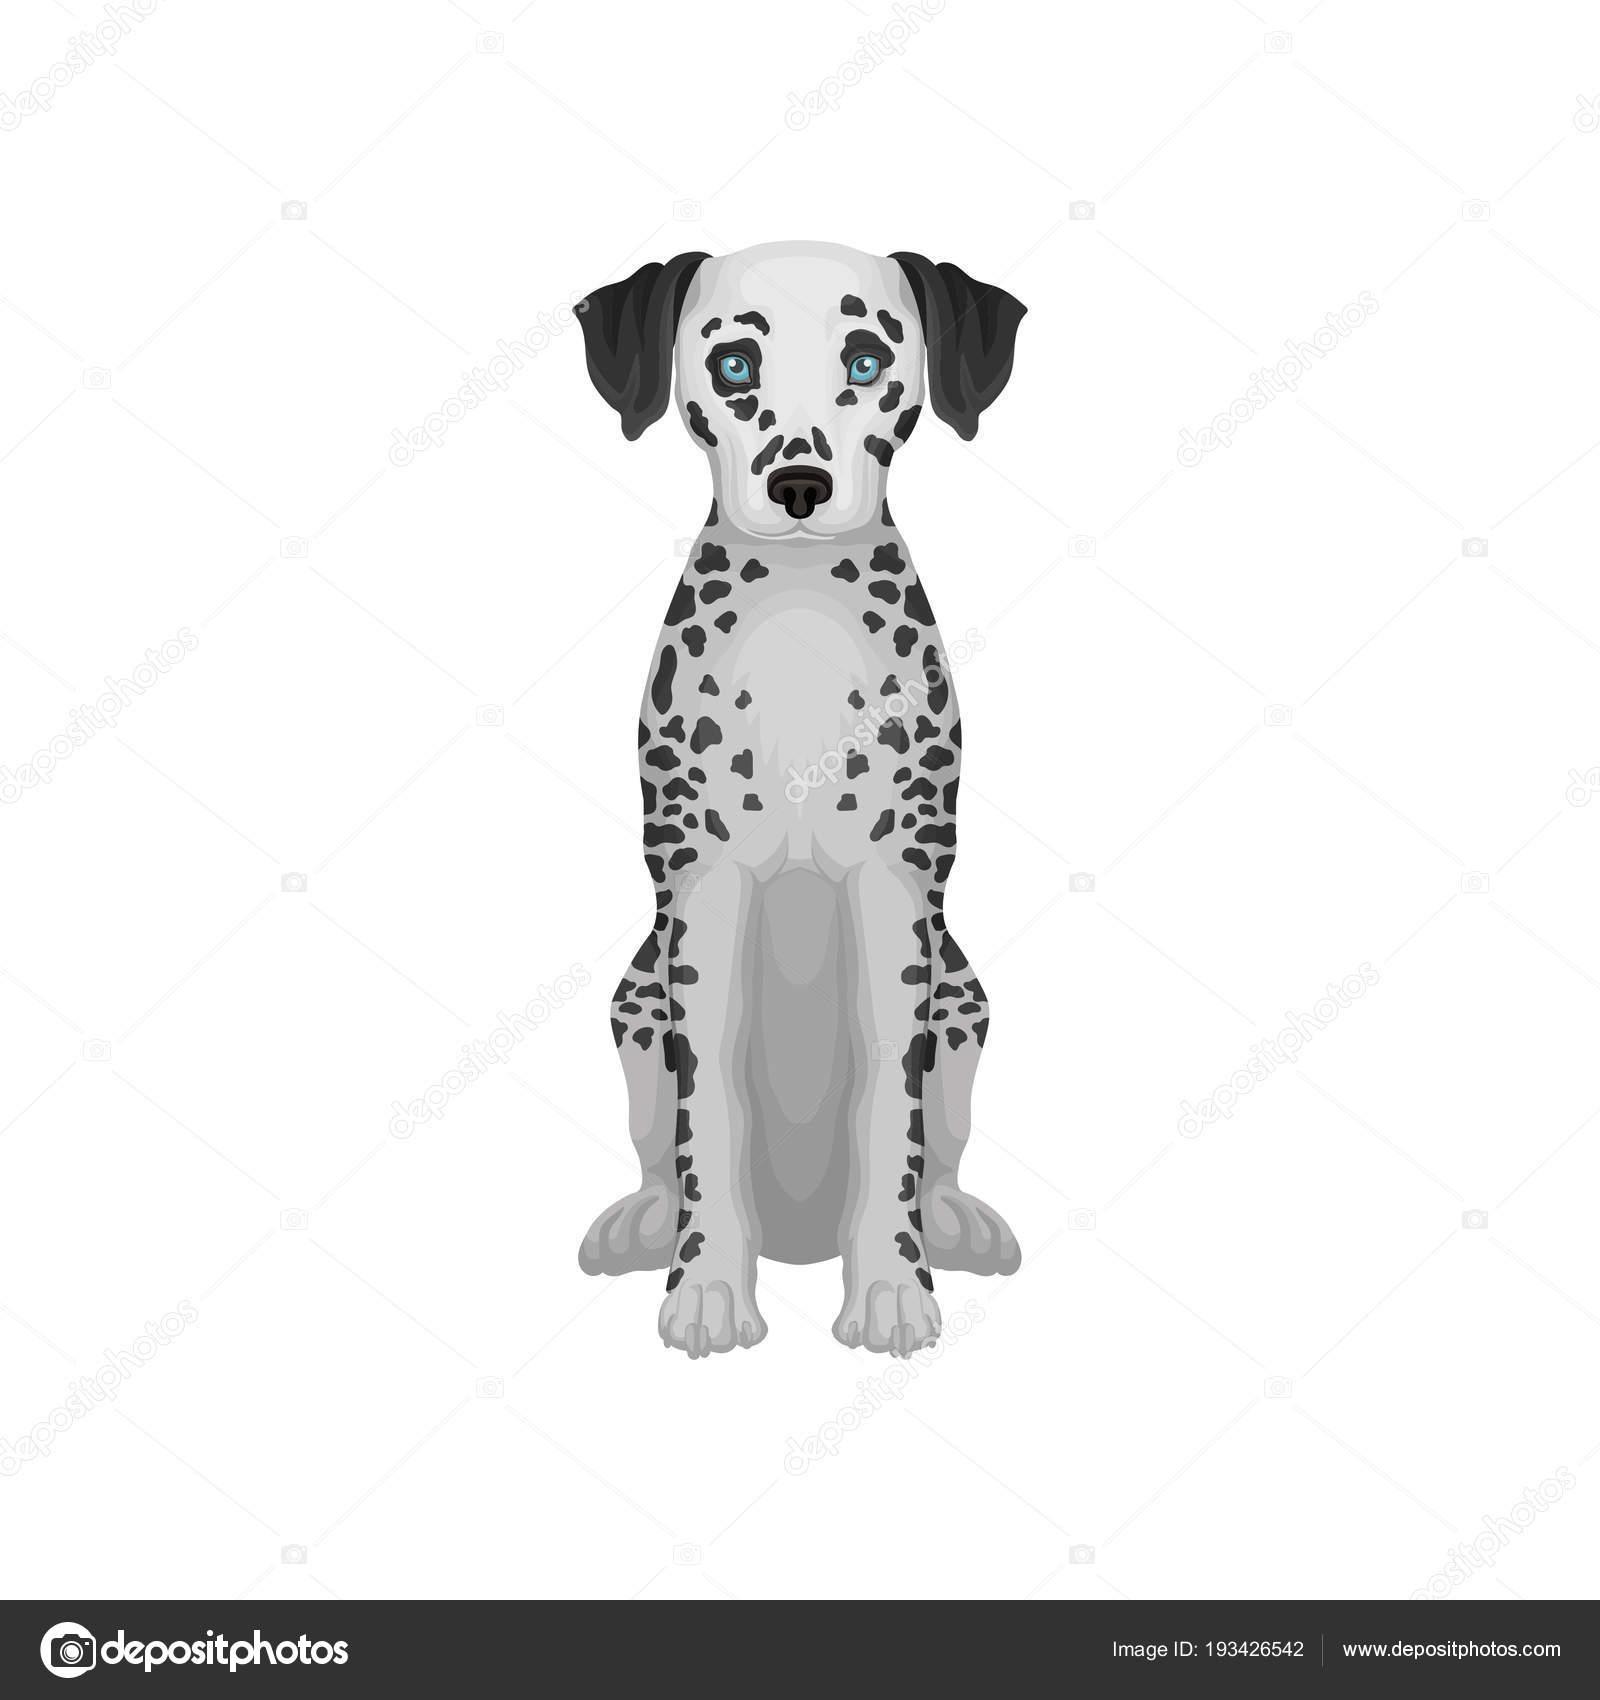 Rozkosny Dalmatin Pes S Modryma Ocima A Cernym Kulate Skvrny Na Tele